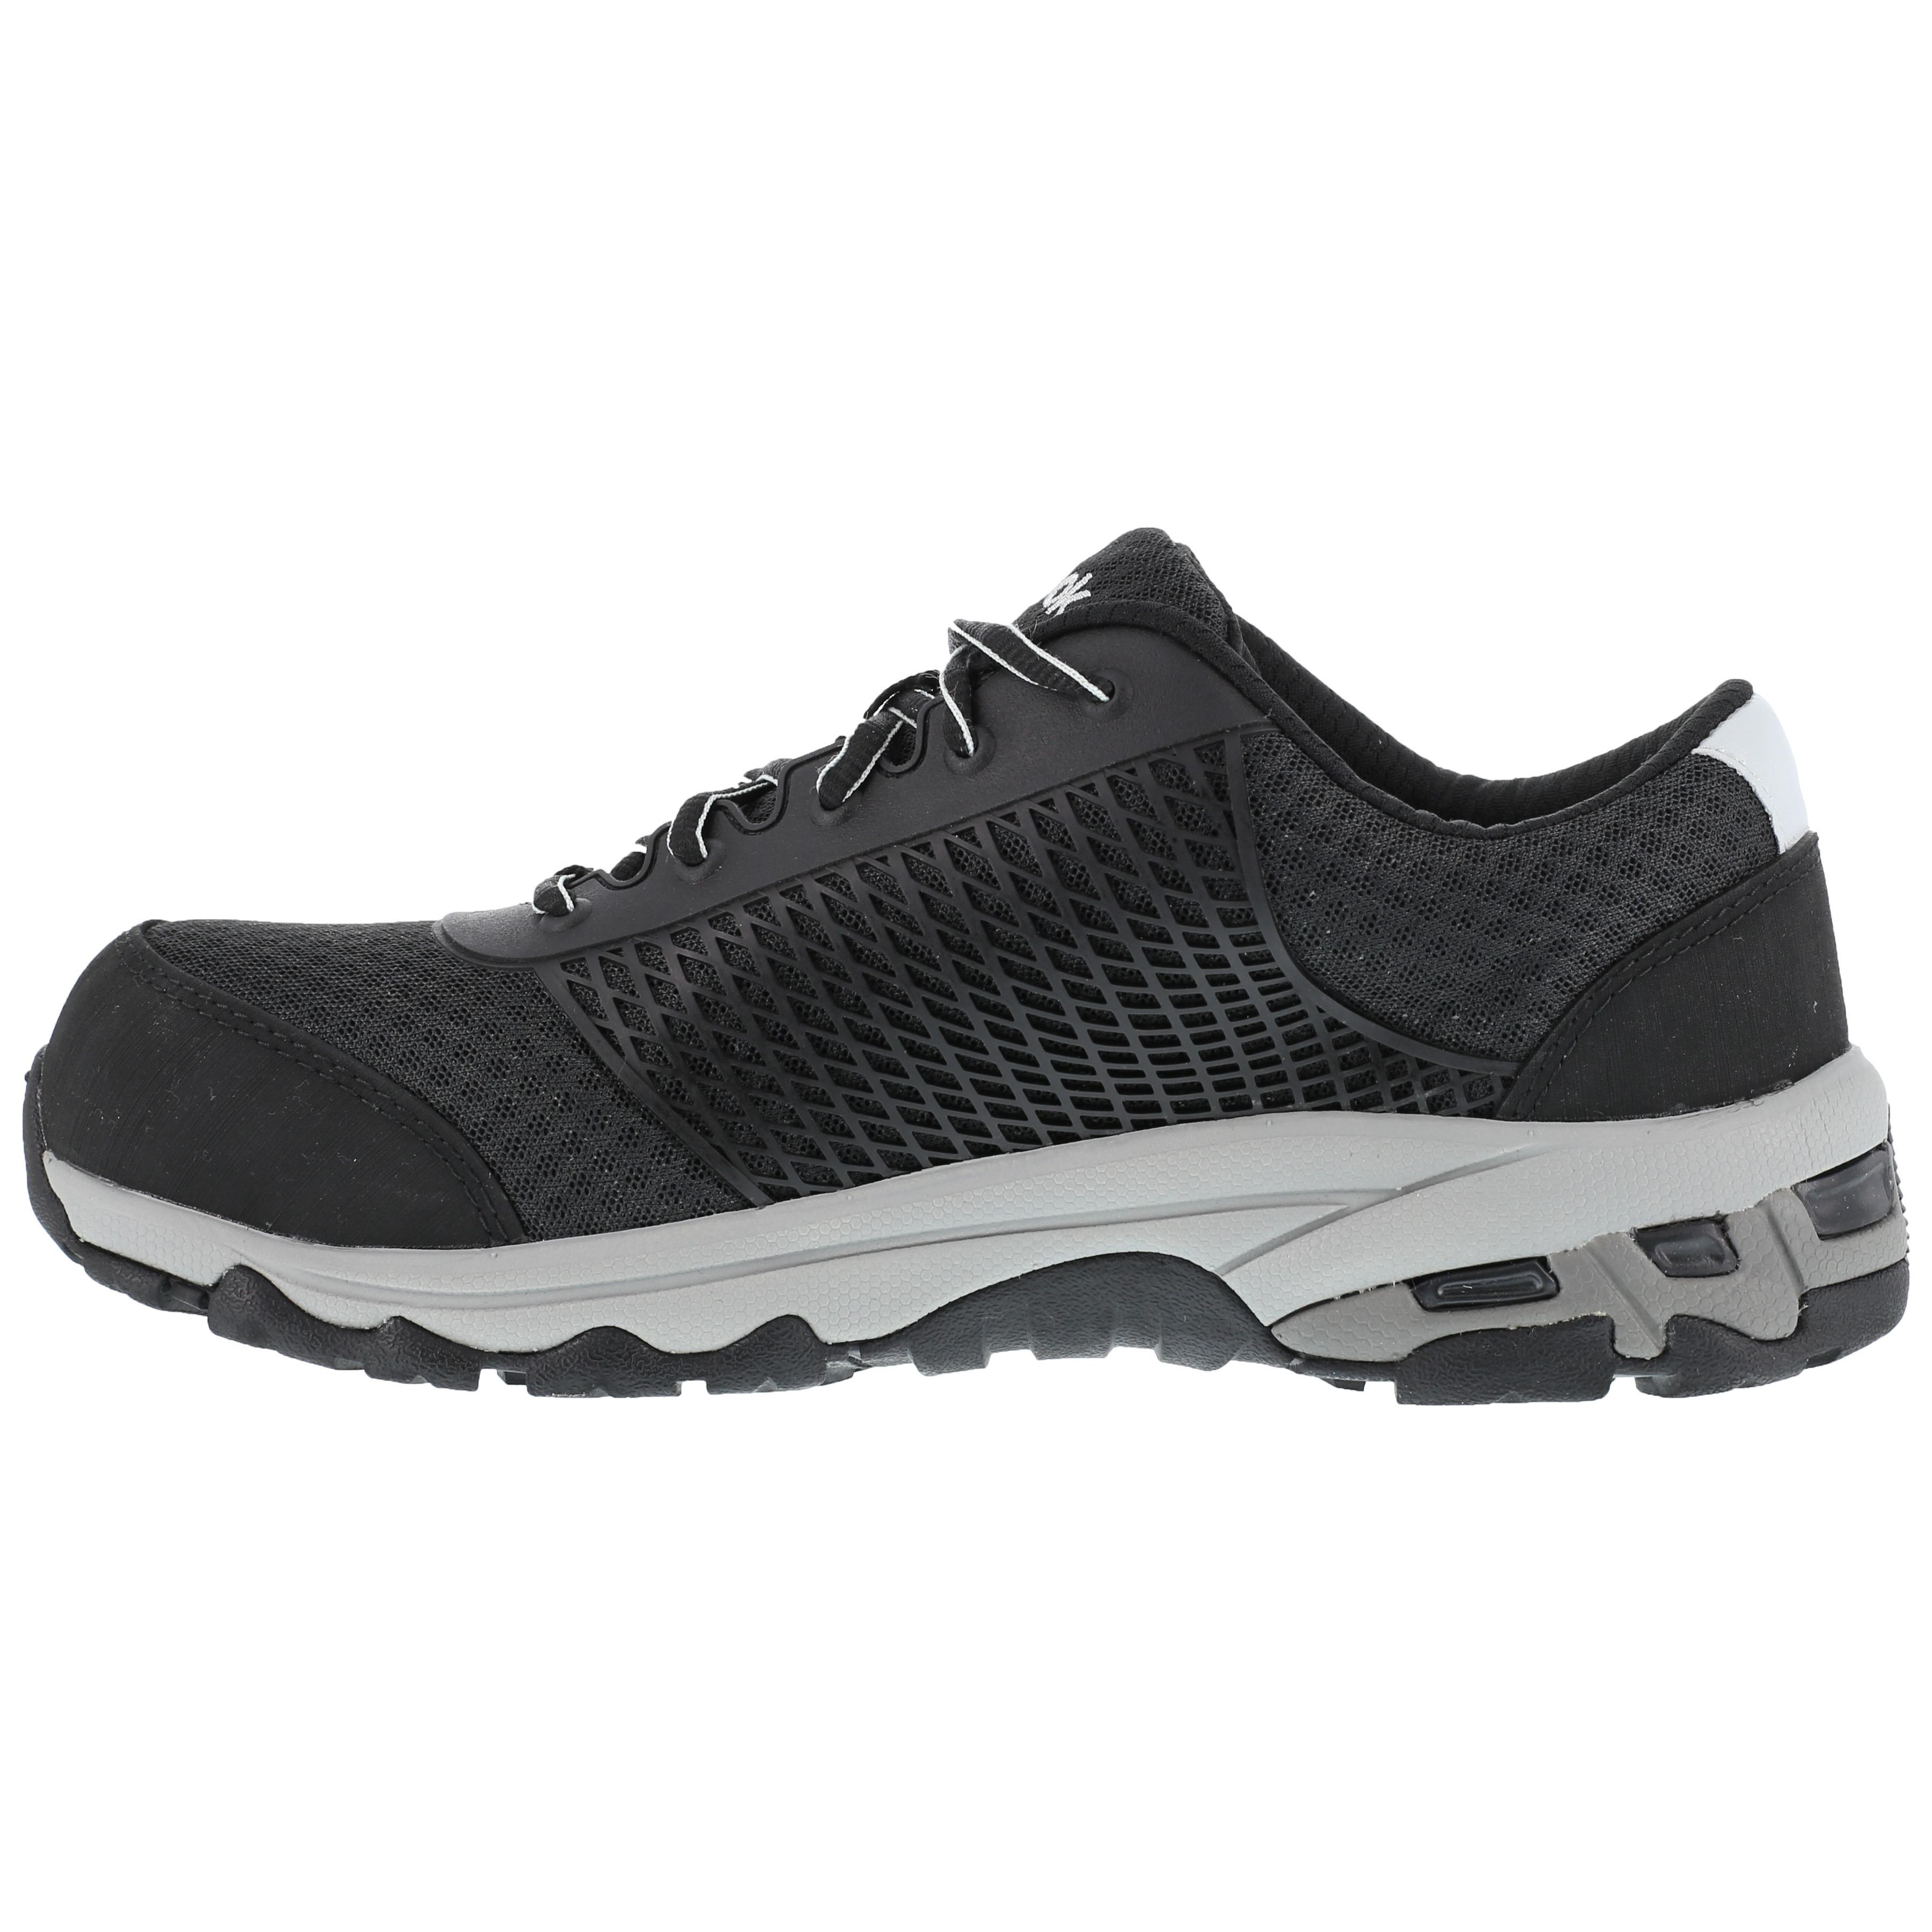 1675055e046 Reebok Heckler Composite Toe Static-Dissipative Work Athletic Shoe. Men s  black ...